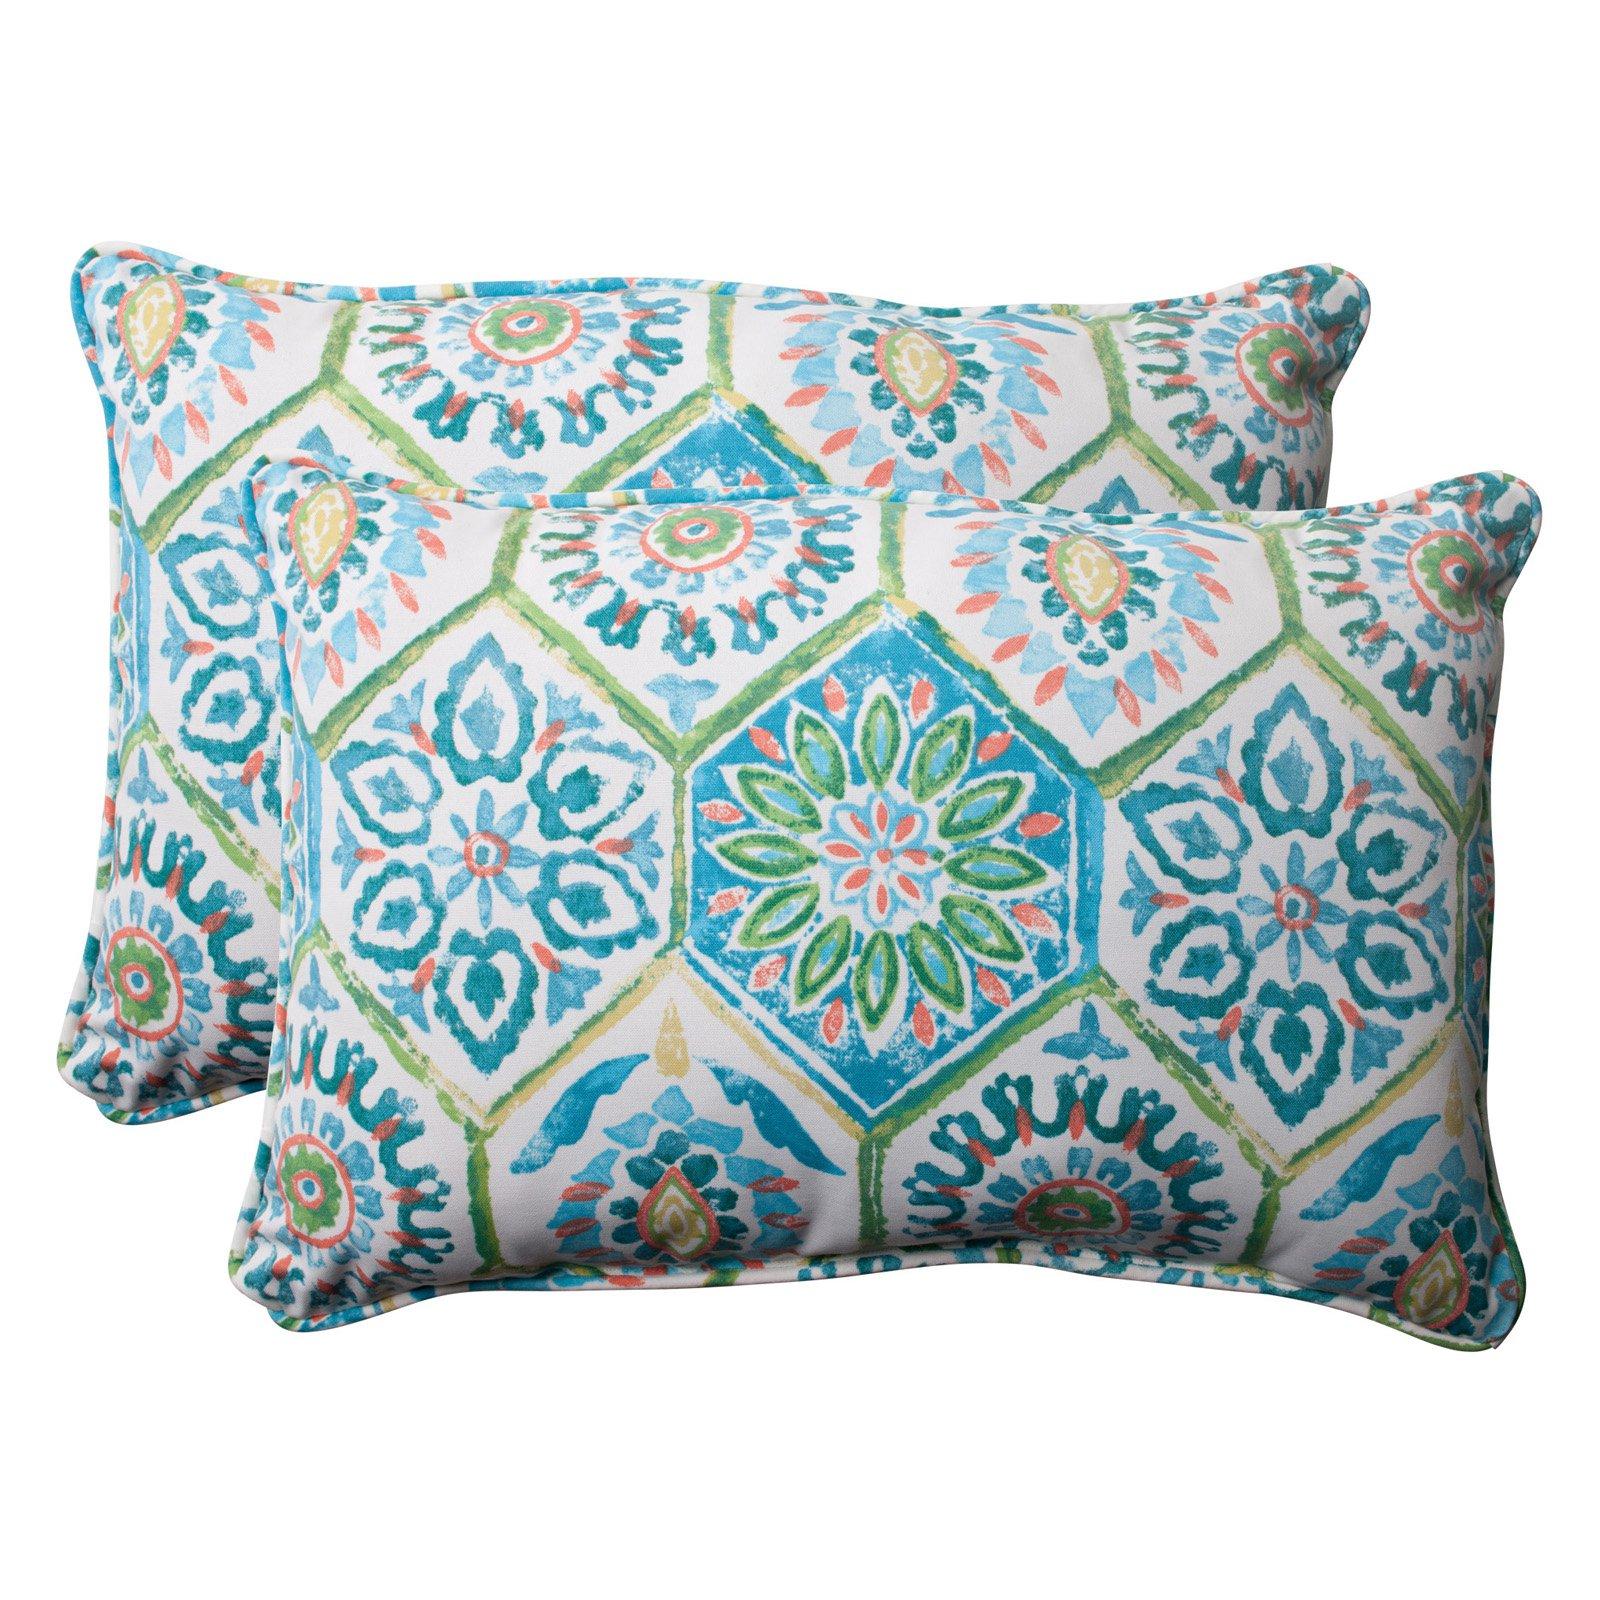 Pillow Perfect Outdoor/ Indoor Summer Breeze Blue Oversized Rectangle Throw Pillow (Set of 2)